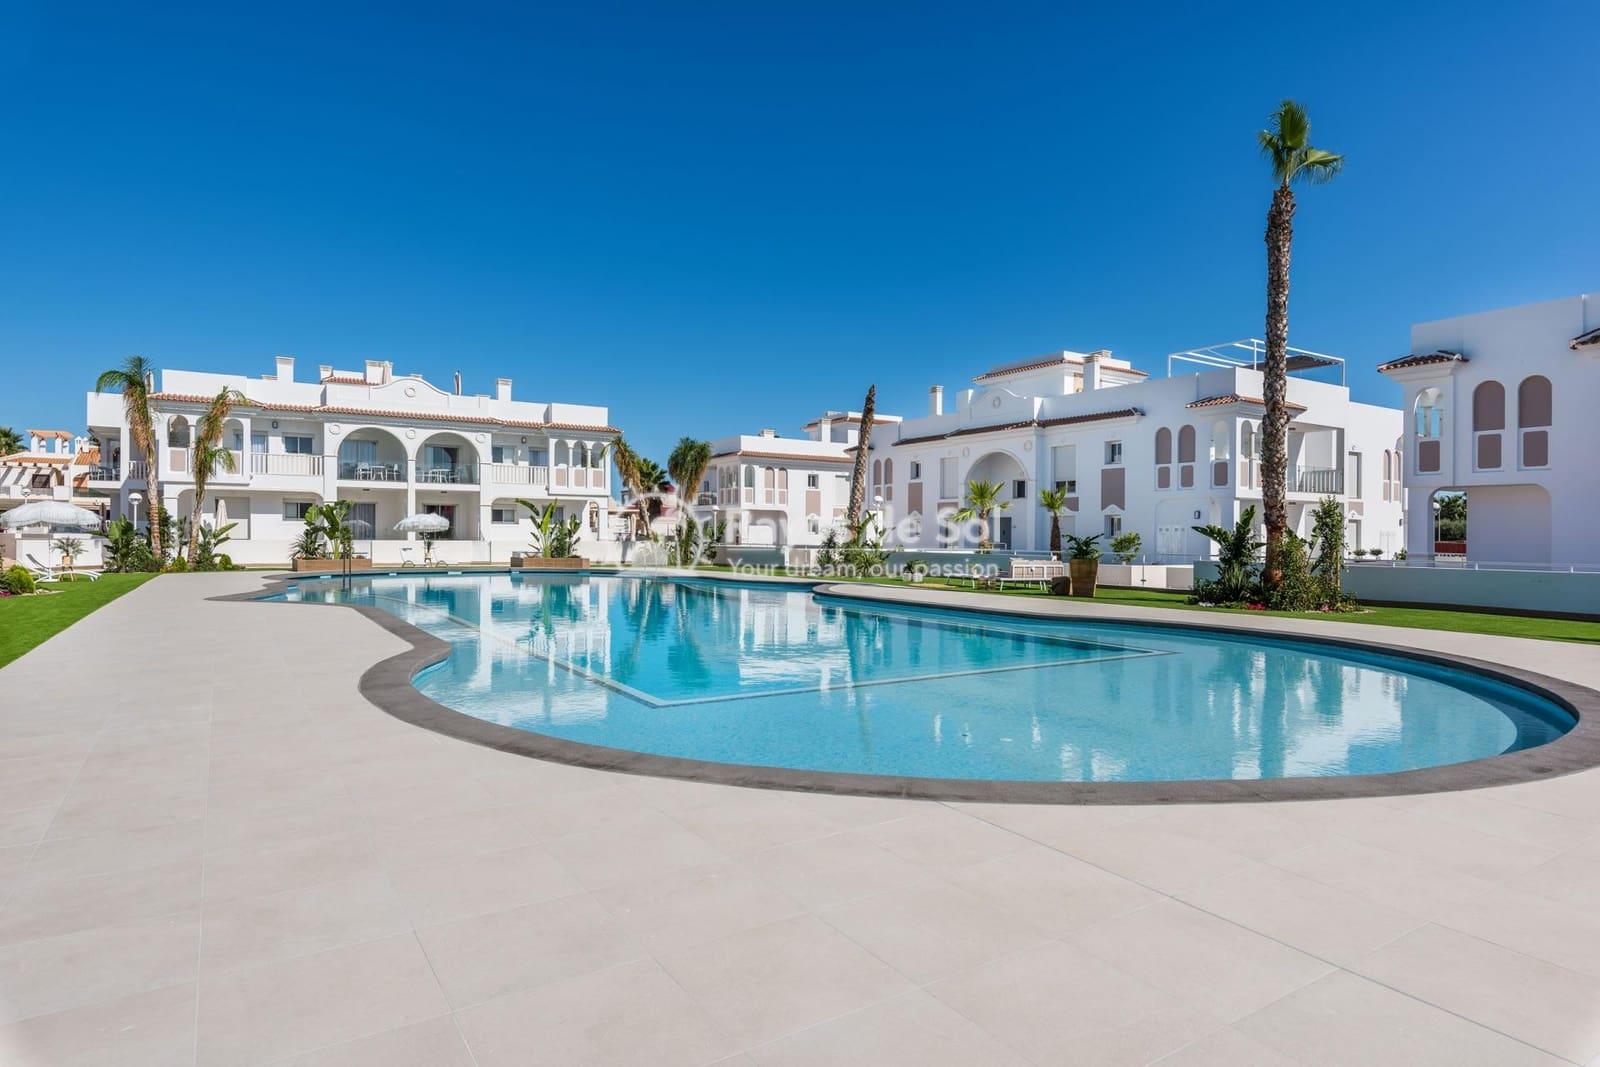 2 bedroom Apartment for sale in Ciudad Quesada with pool - € 215,000 (Ref: 5394979)